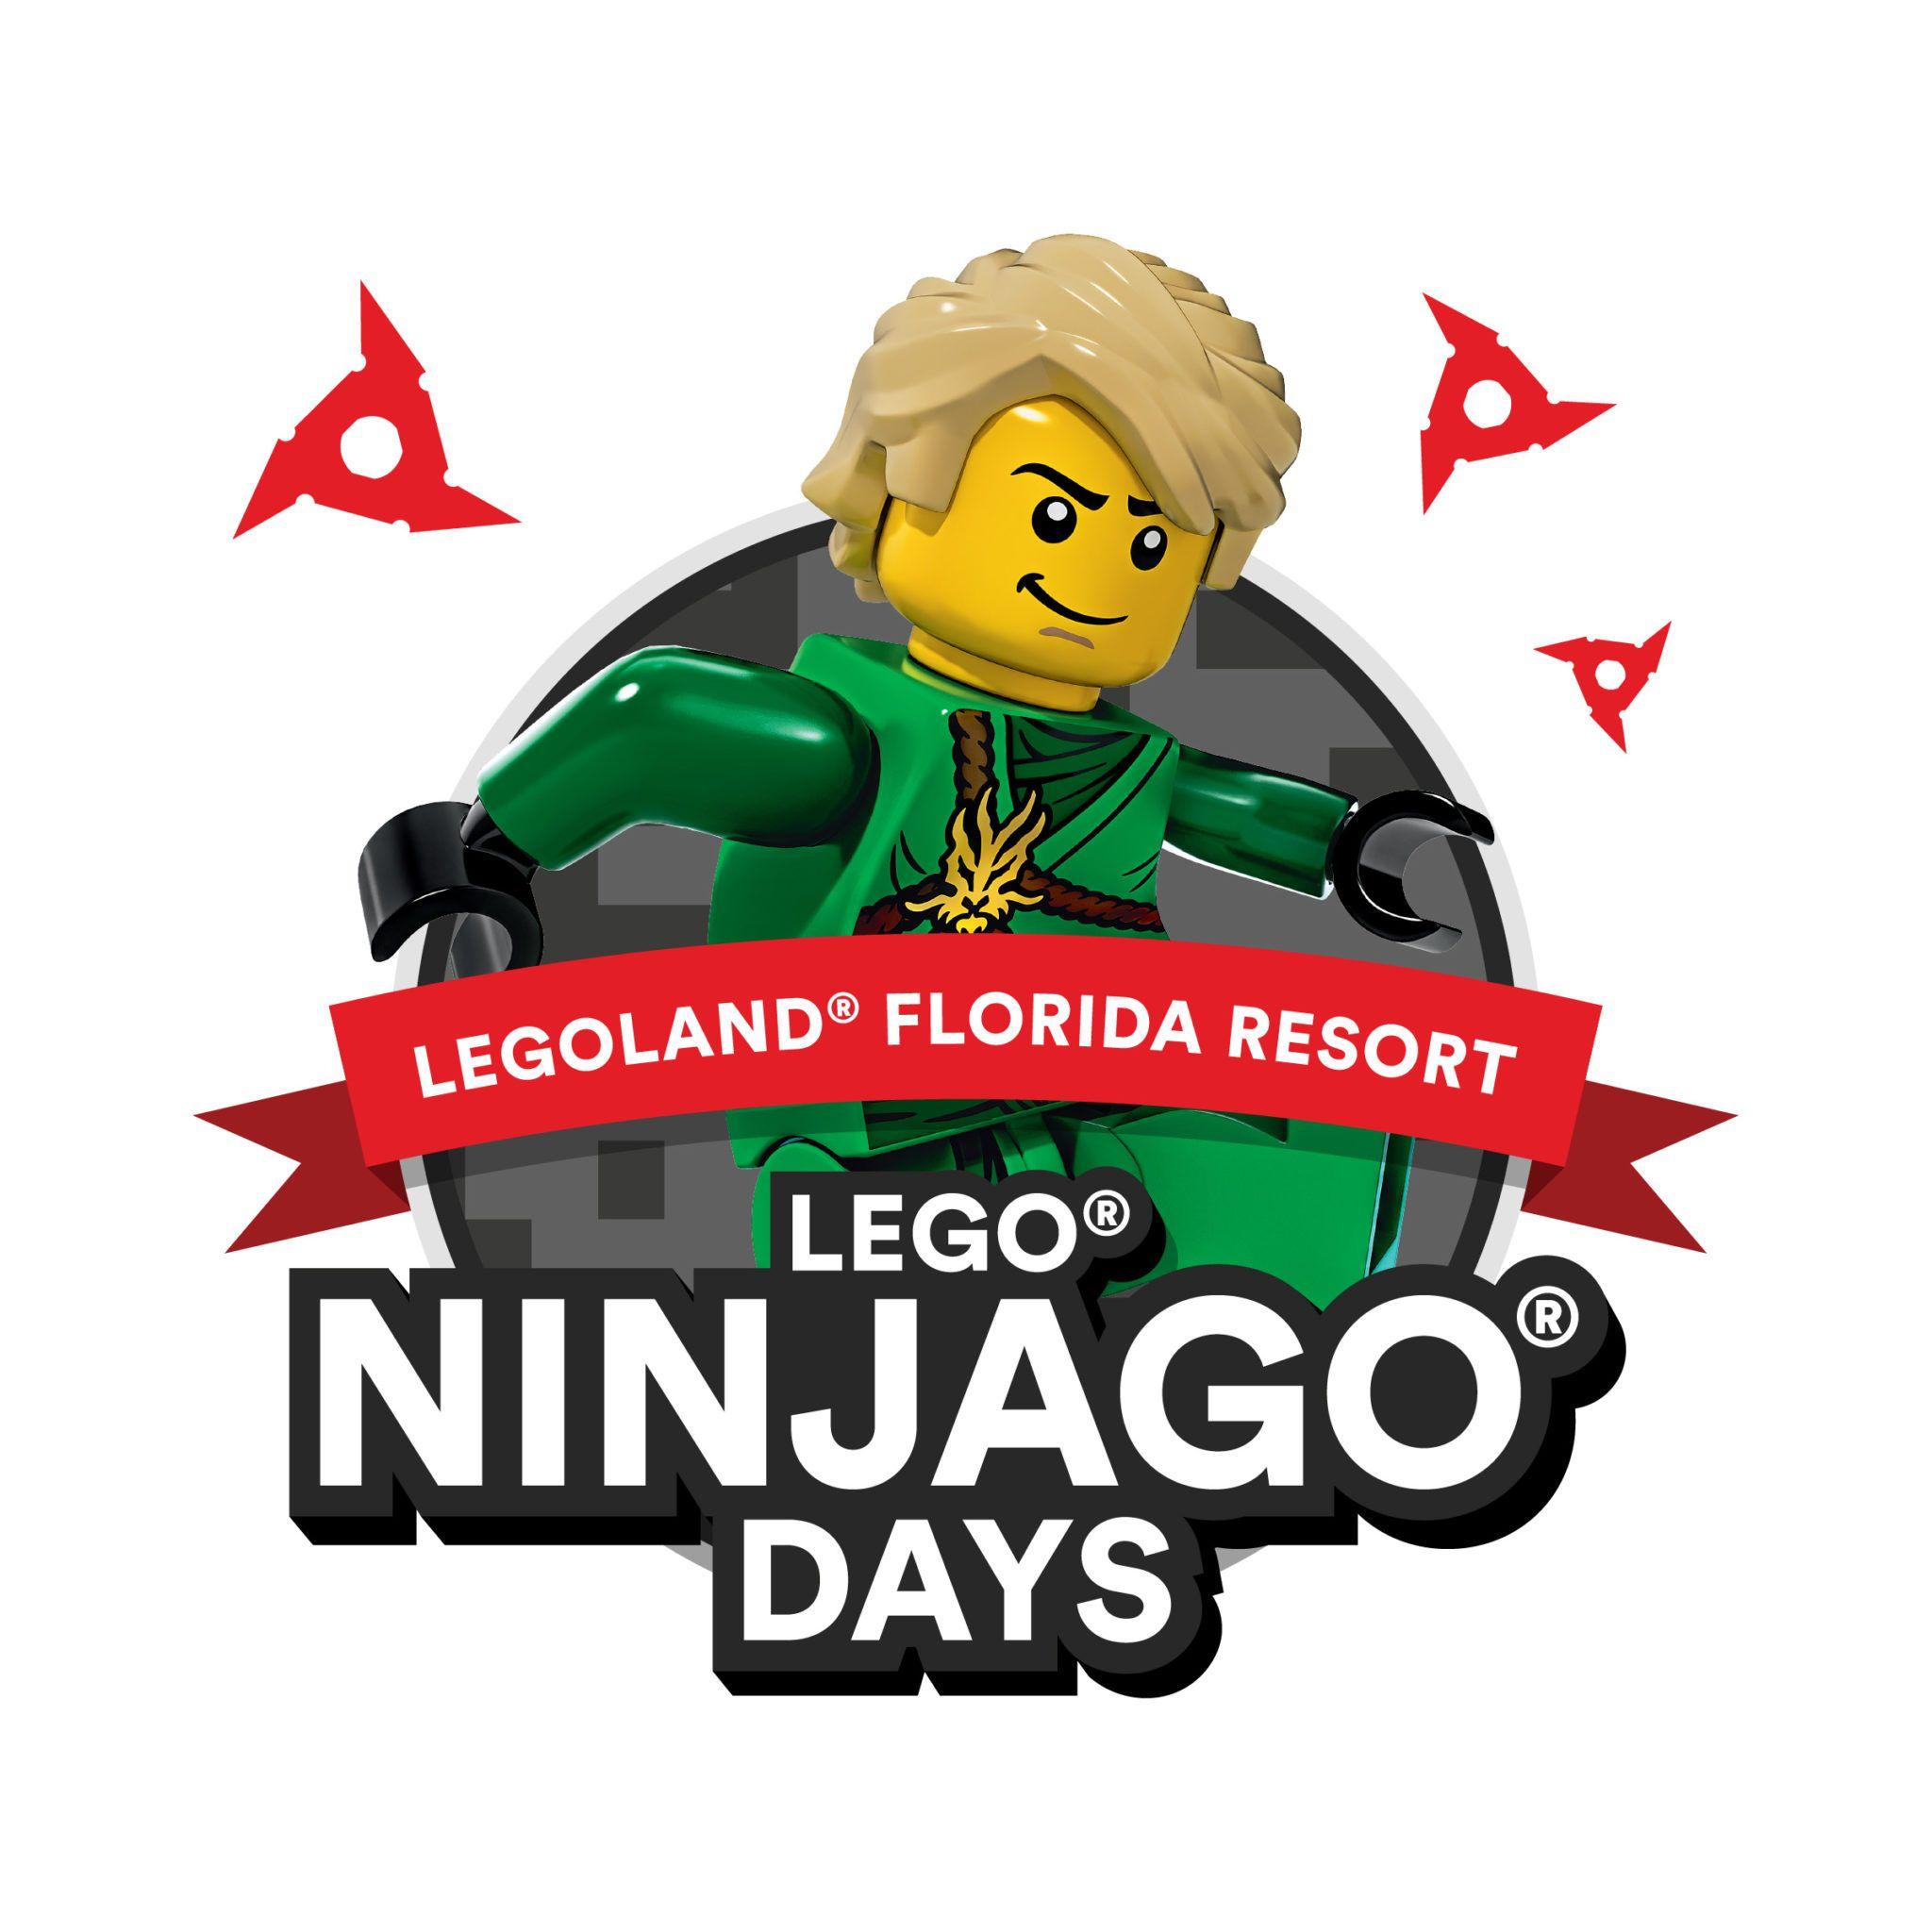 LEGOLAND Florida Resort Announces New 'LEGO NINJAGO Days